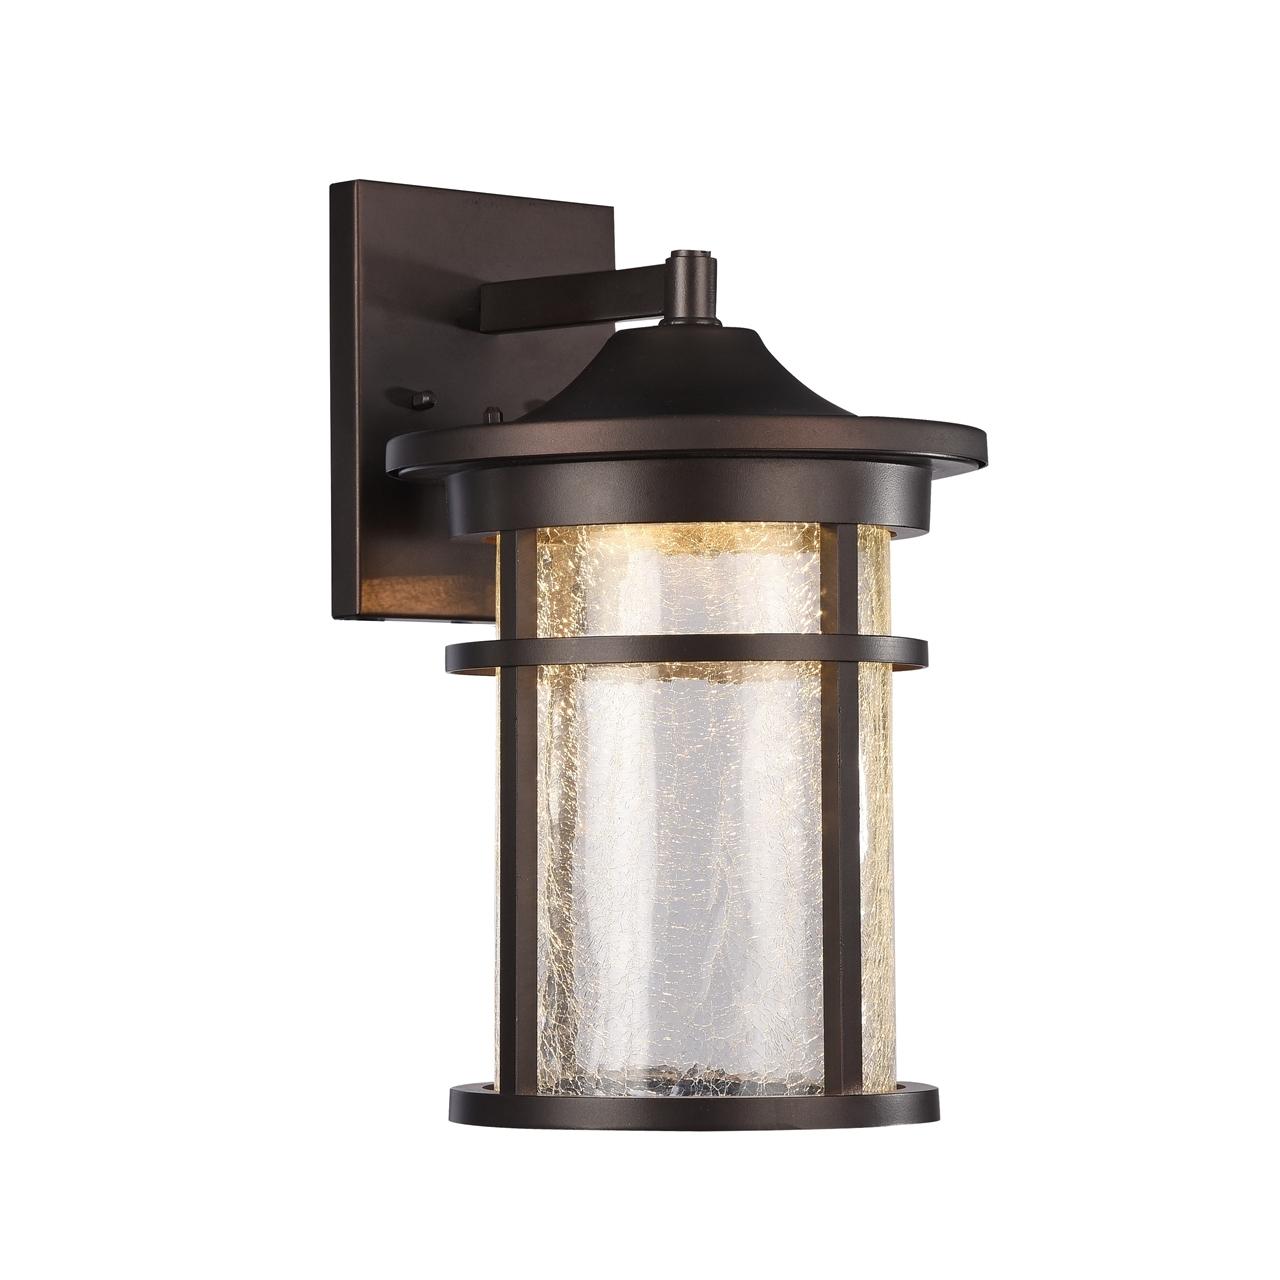 CHLOE Lighting, Inc Lighting wholesale, Lighting ... on Sconce Outdoor Lighting id=42935